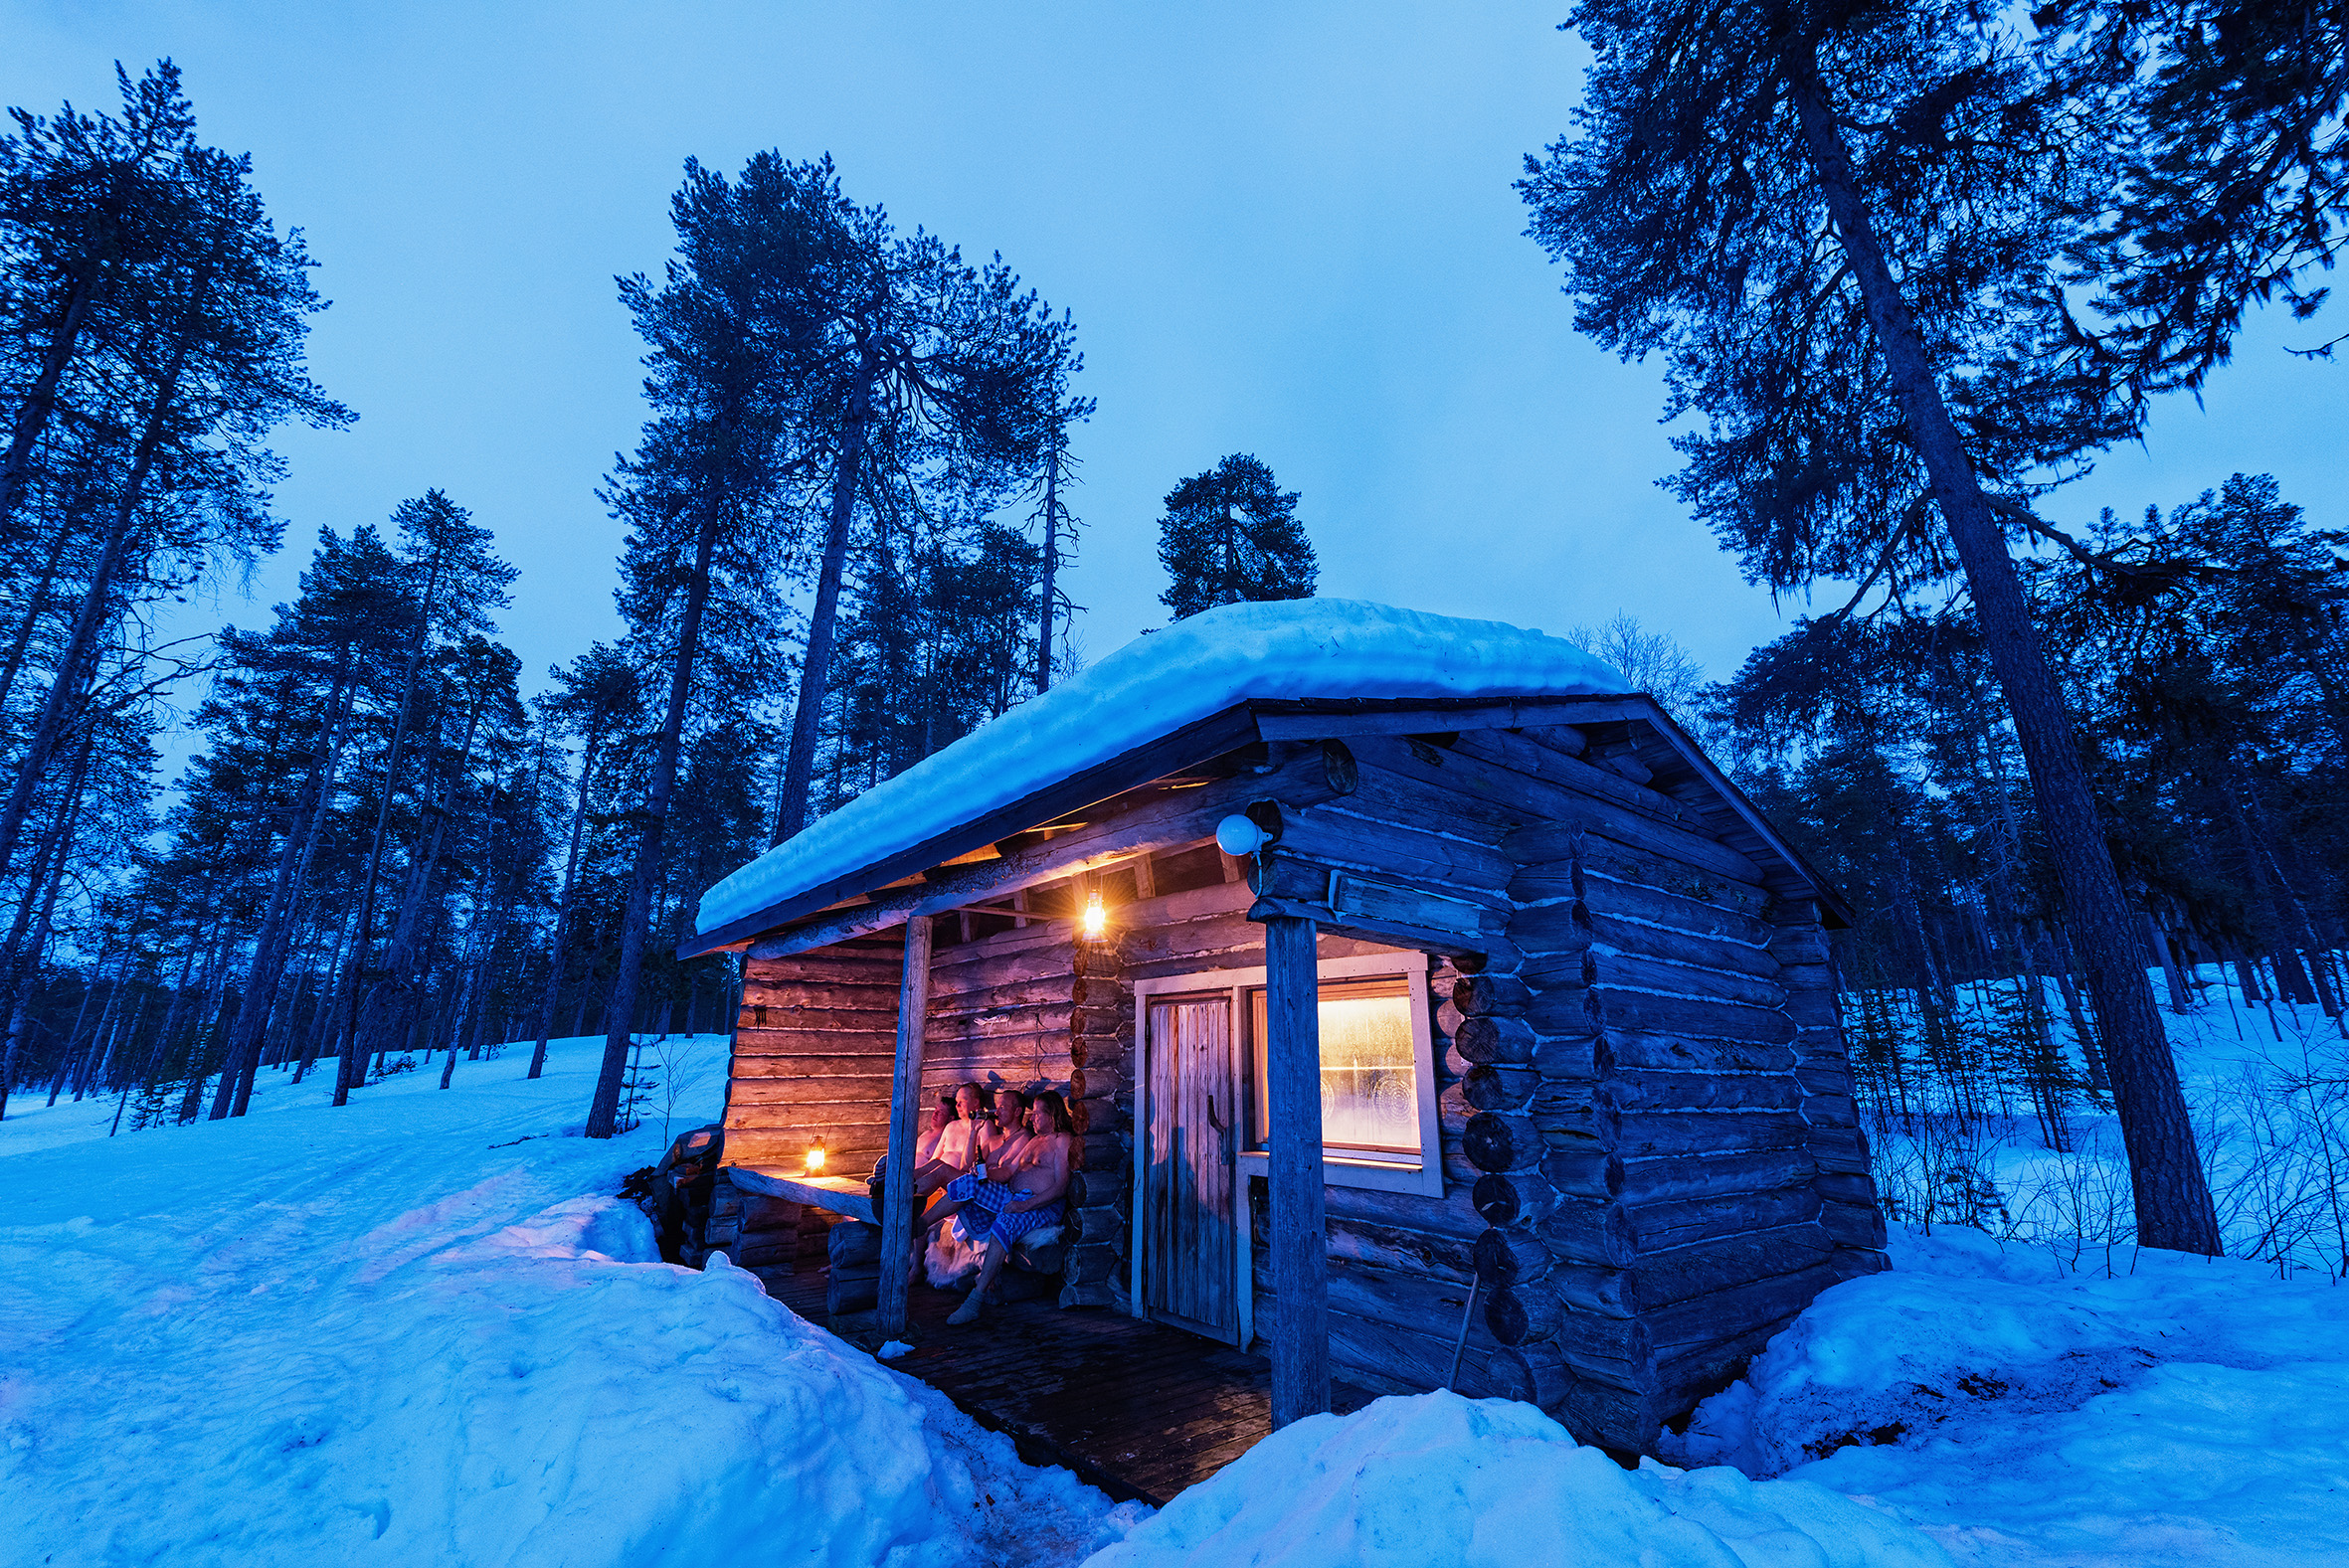 Story: Rauhoitu! Relax the finnish way